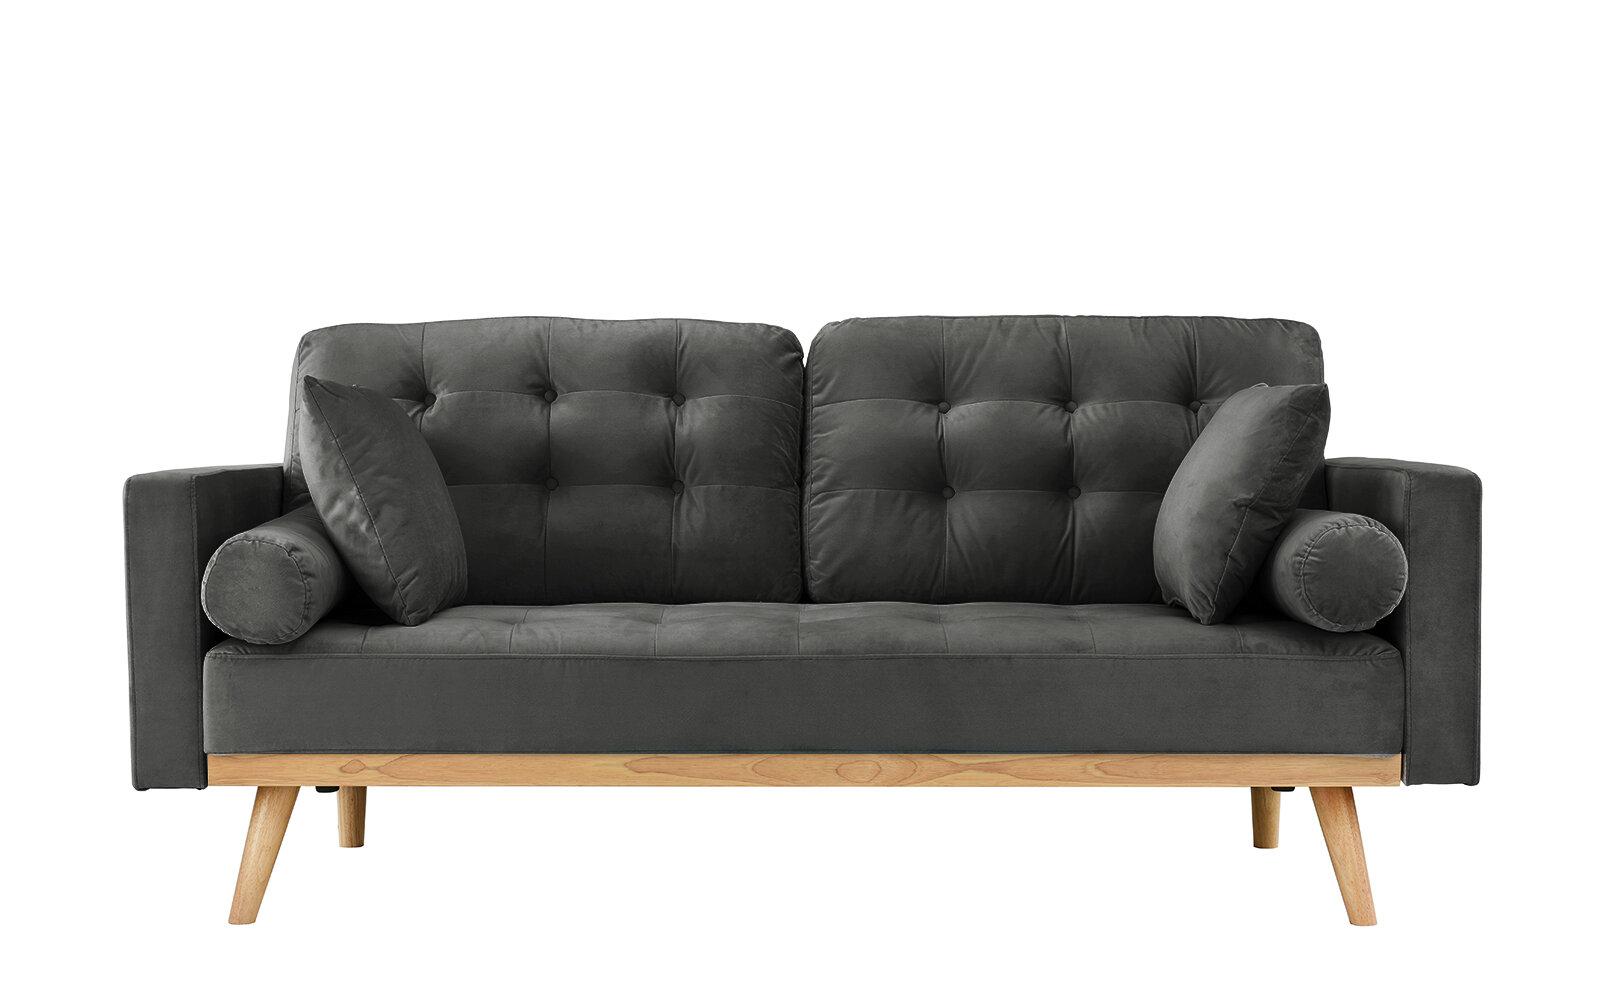 Wrought Studio Seagle Mid Century Modern Sofa Reviews Wayfair